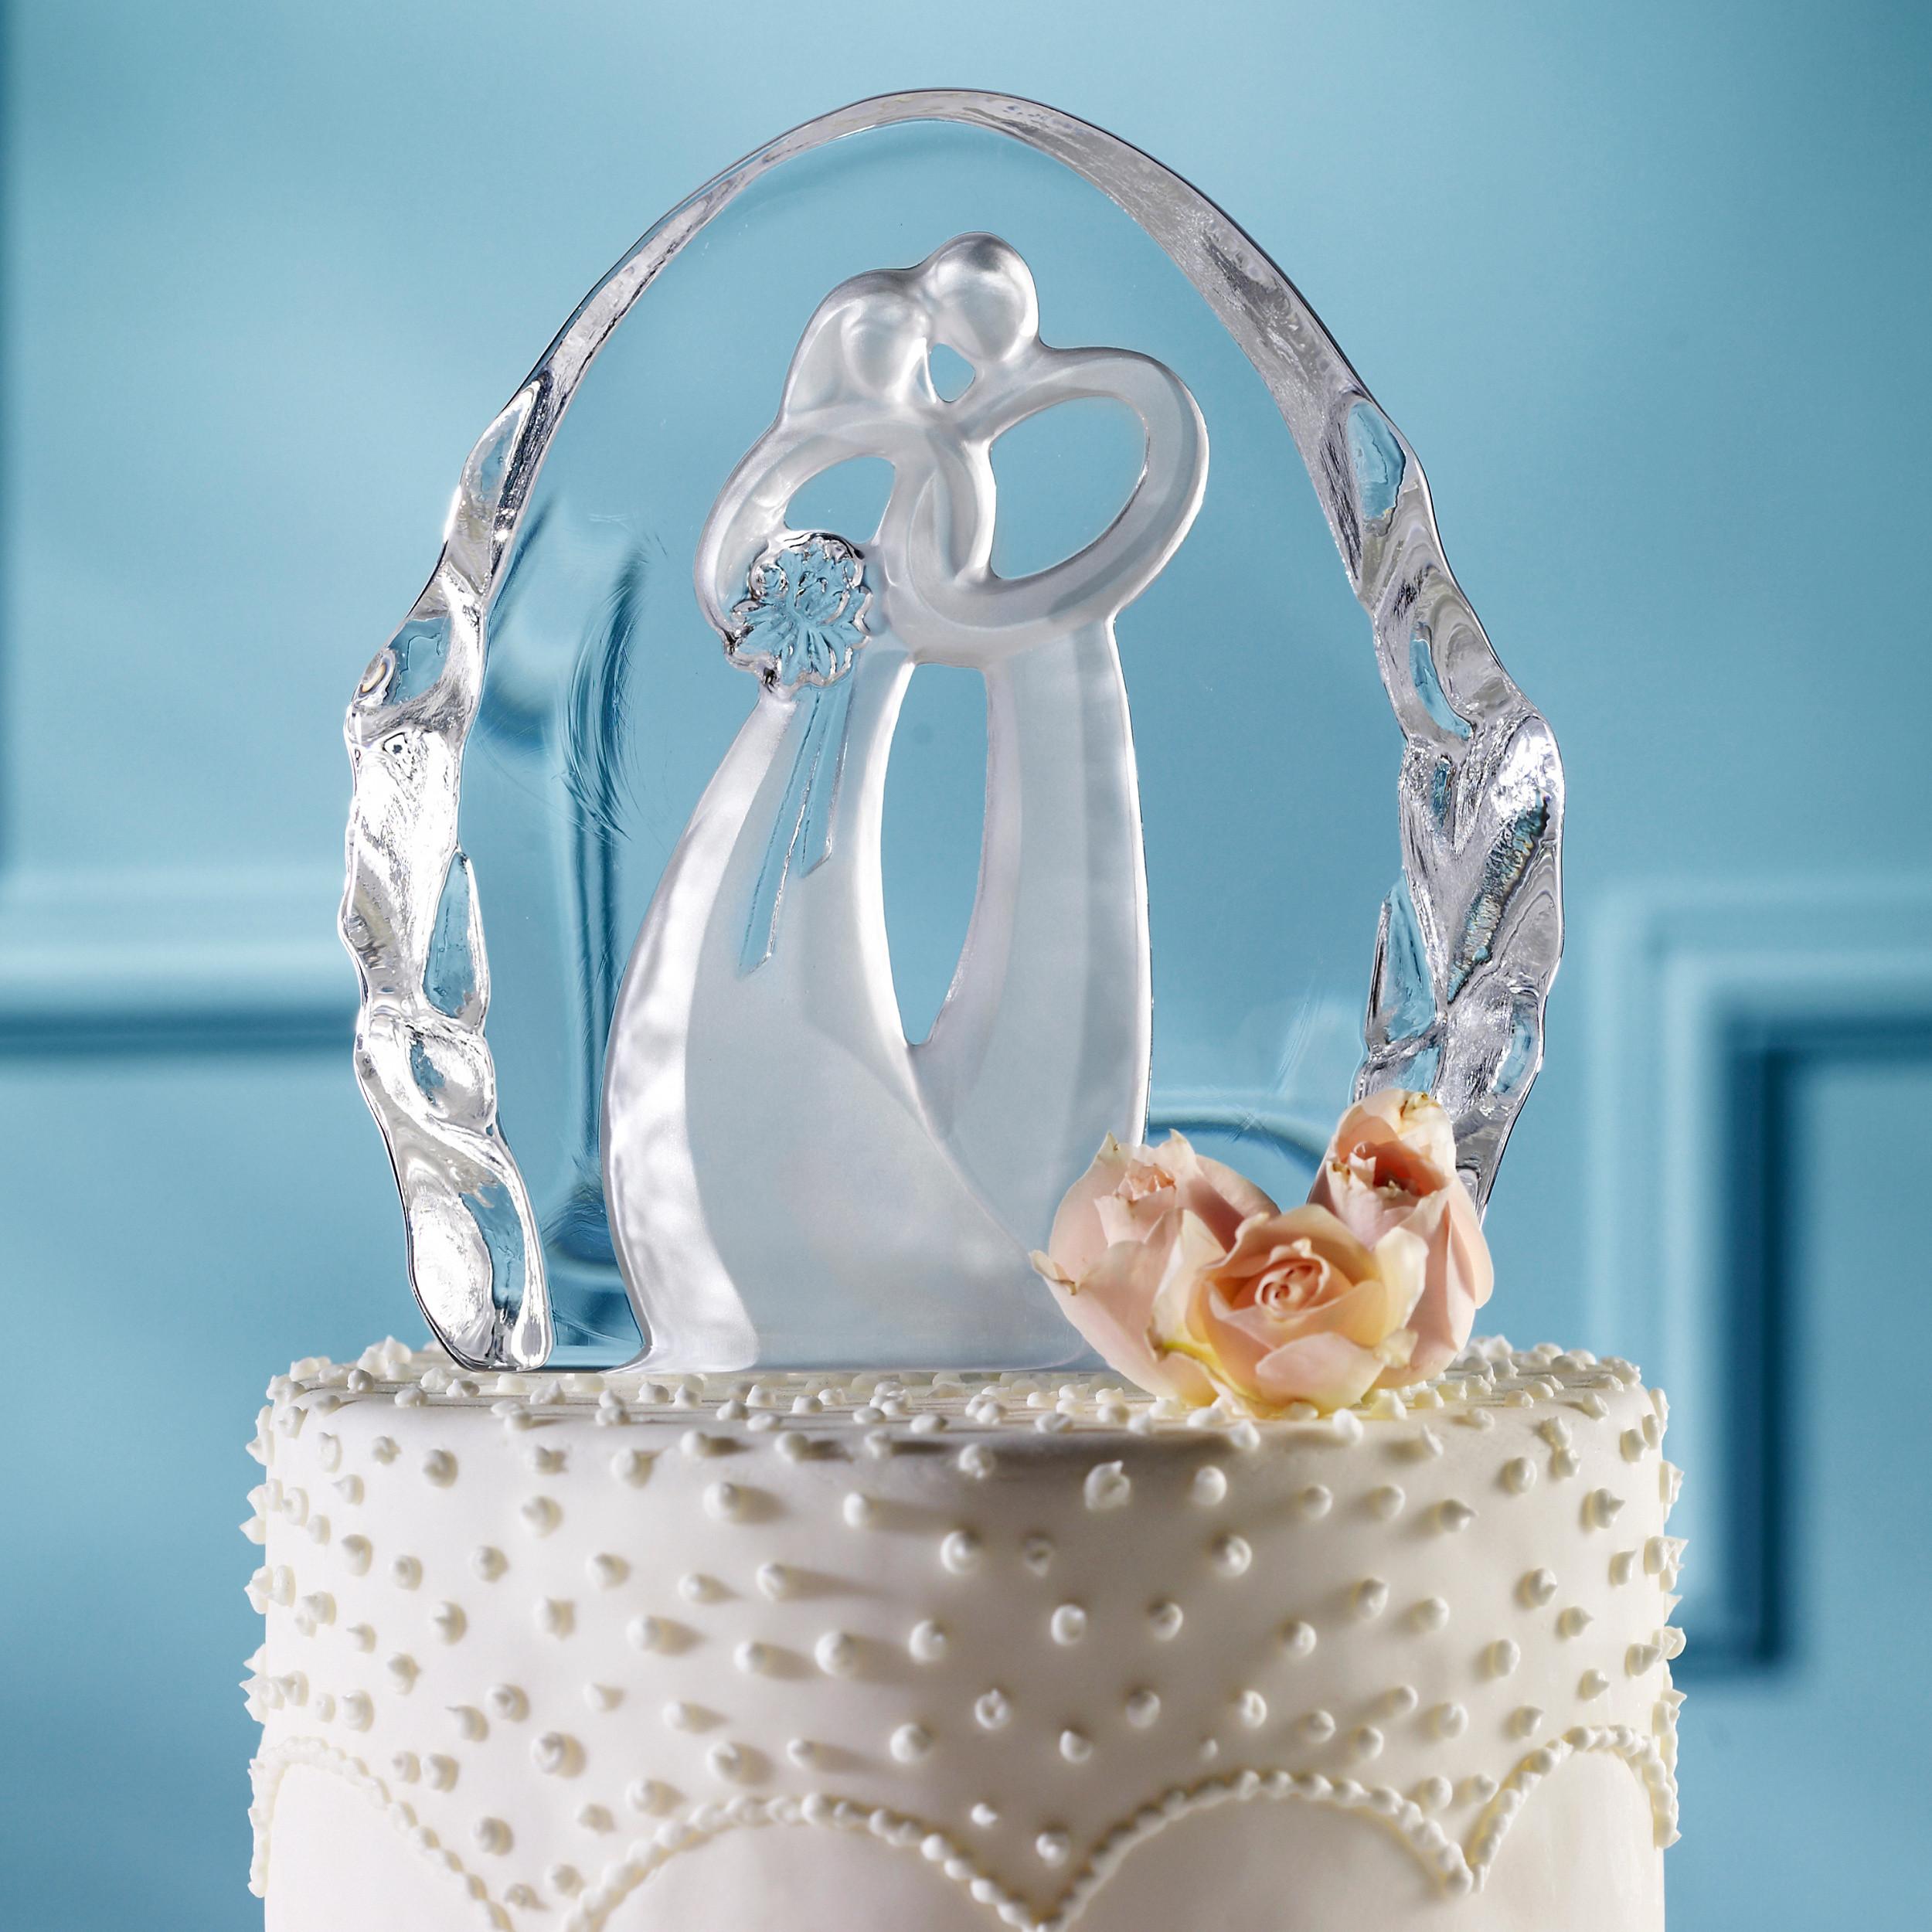 Pretty Elegant Wedding Cakes Big Wedding Cake Design Ideas Solid 6 Tier Wedding Cake Wedding Cakes Charleston Sc Young Wedding Cakes Bay Area GreenWedding Cakes Las Vegas Symbol Of Love Wedding Cake Topper | Glass Couple Wedding Cake Top